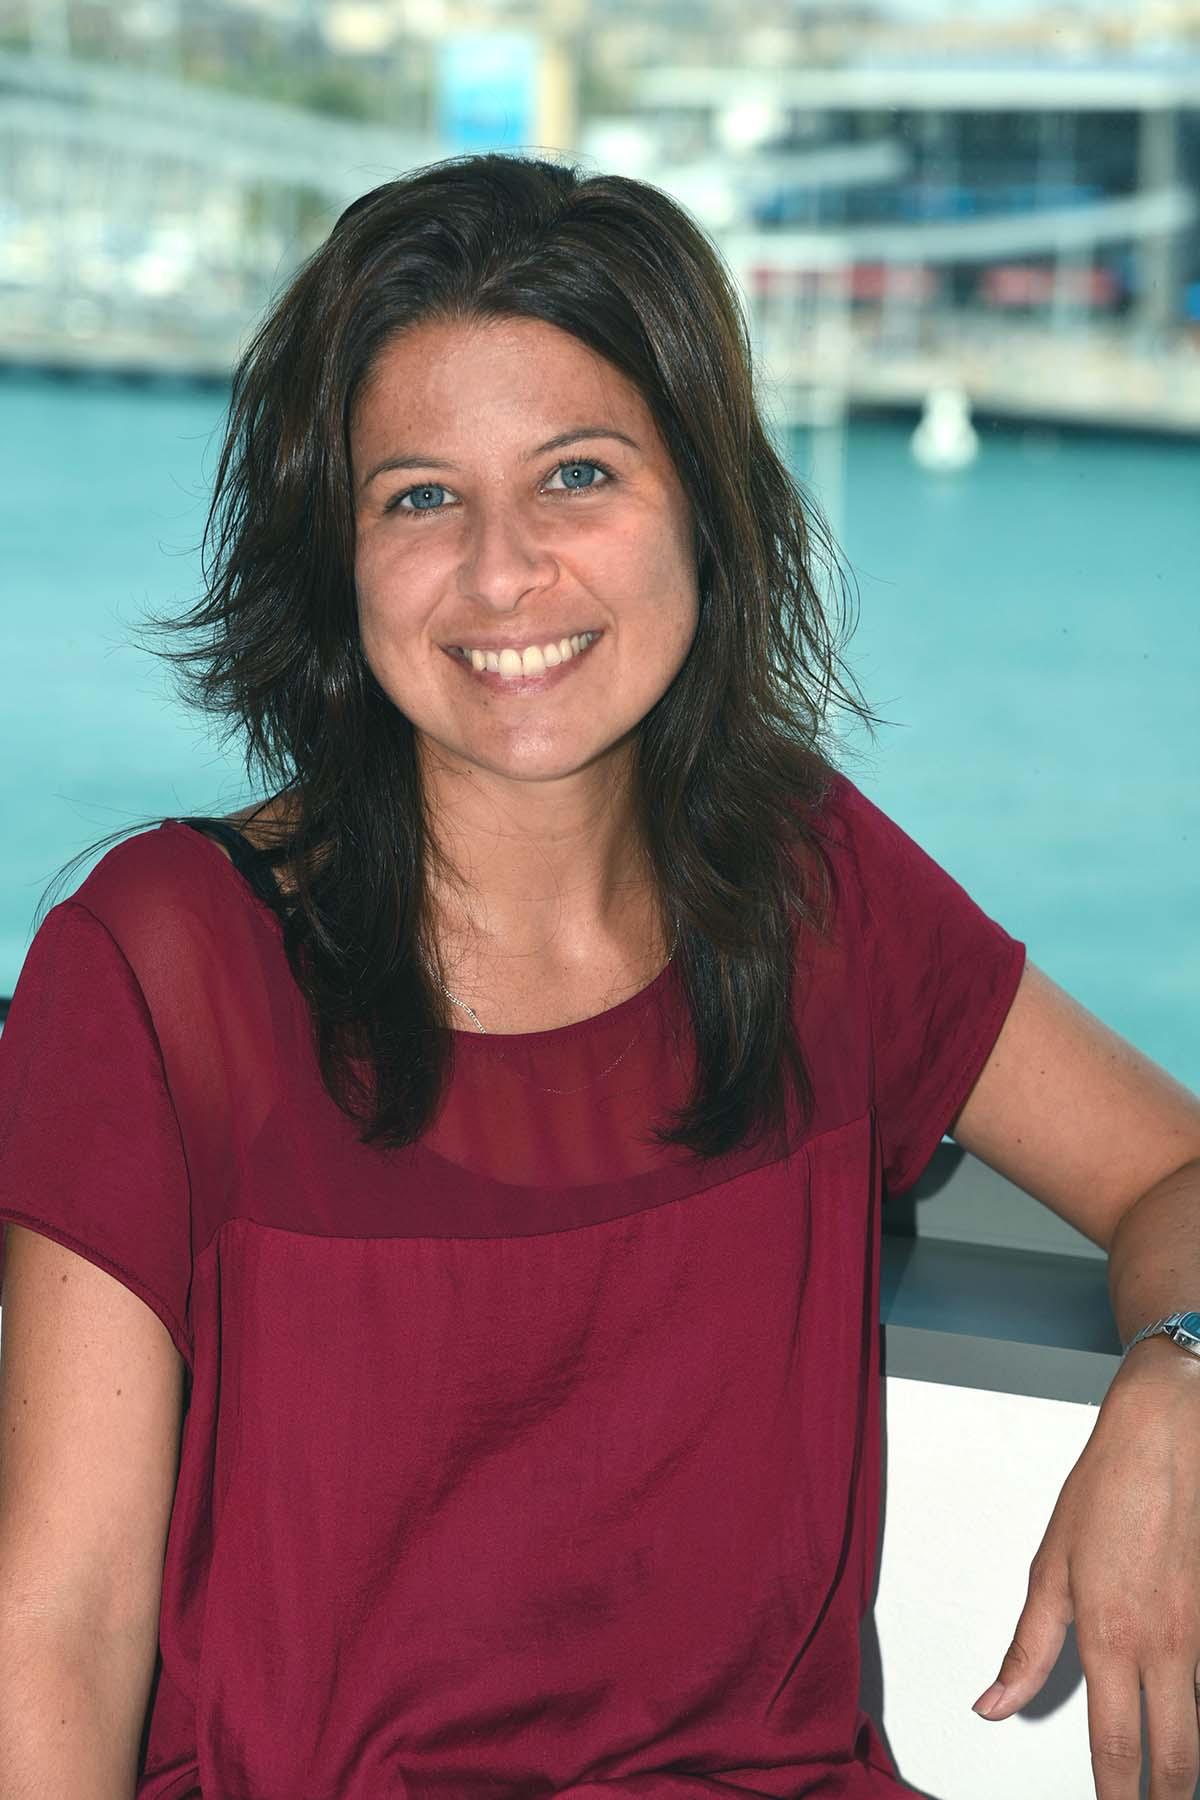 Entrevista_Estela_Viars_-_Relacin_Clientes_Cyberclick_buena